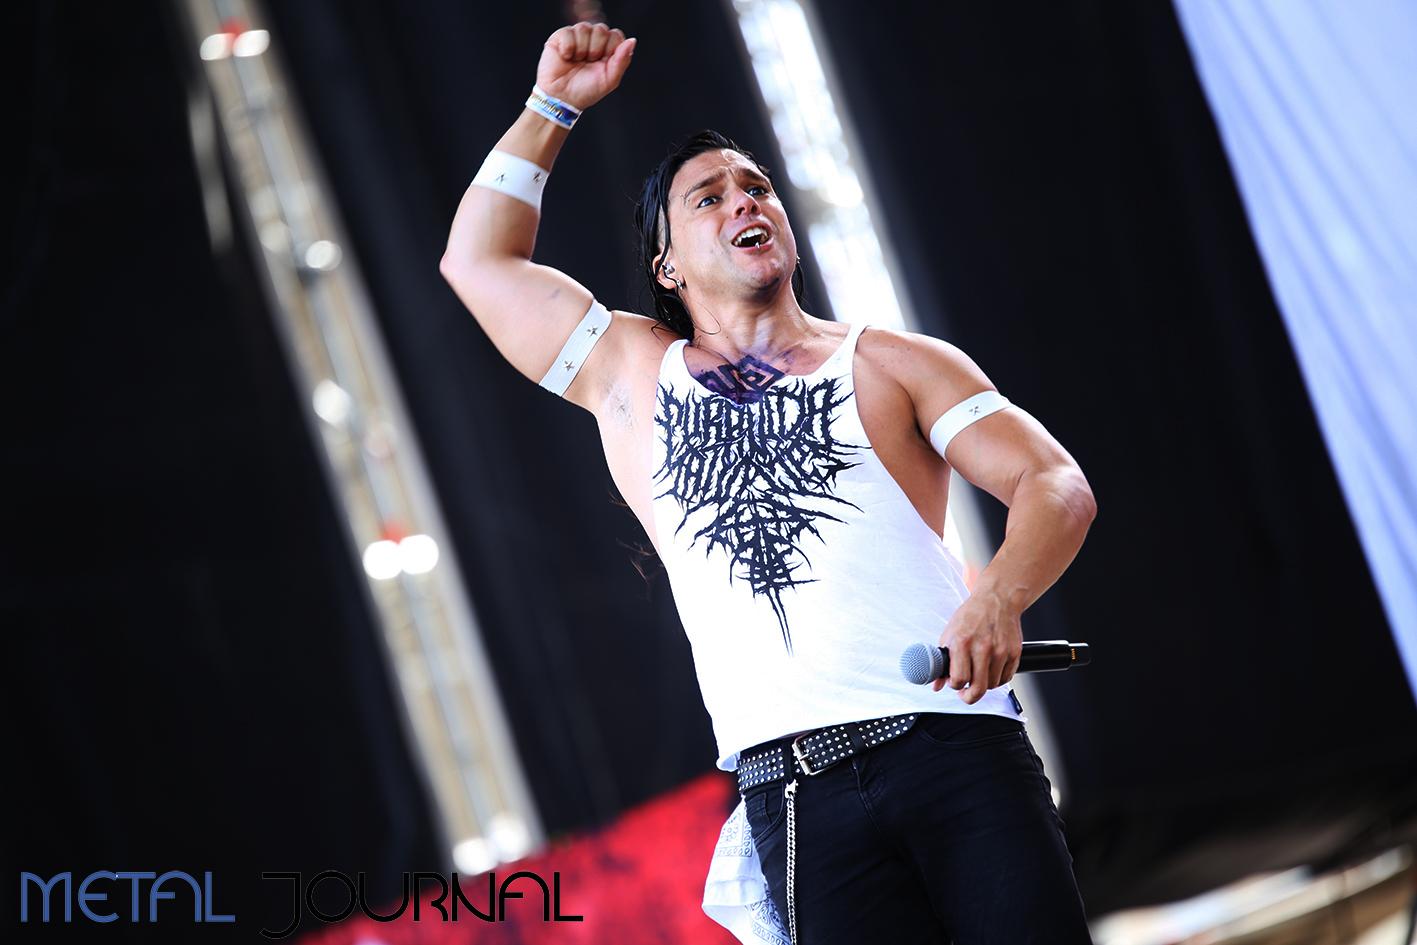 saratoga - leyendas del rock 2019 metal journal pic 1